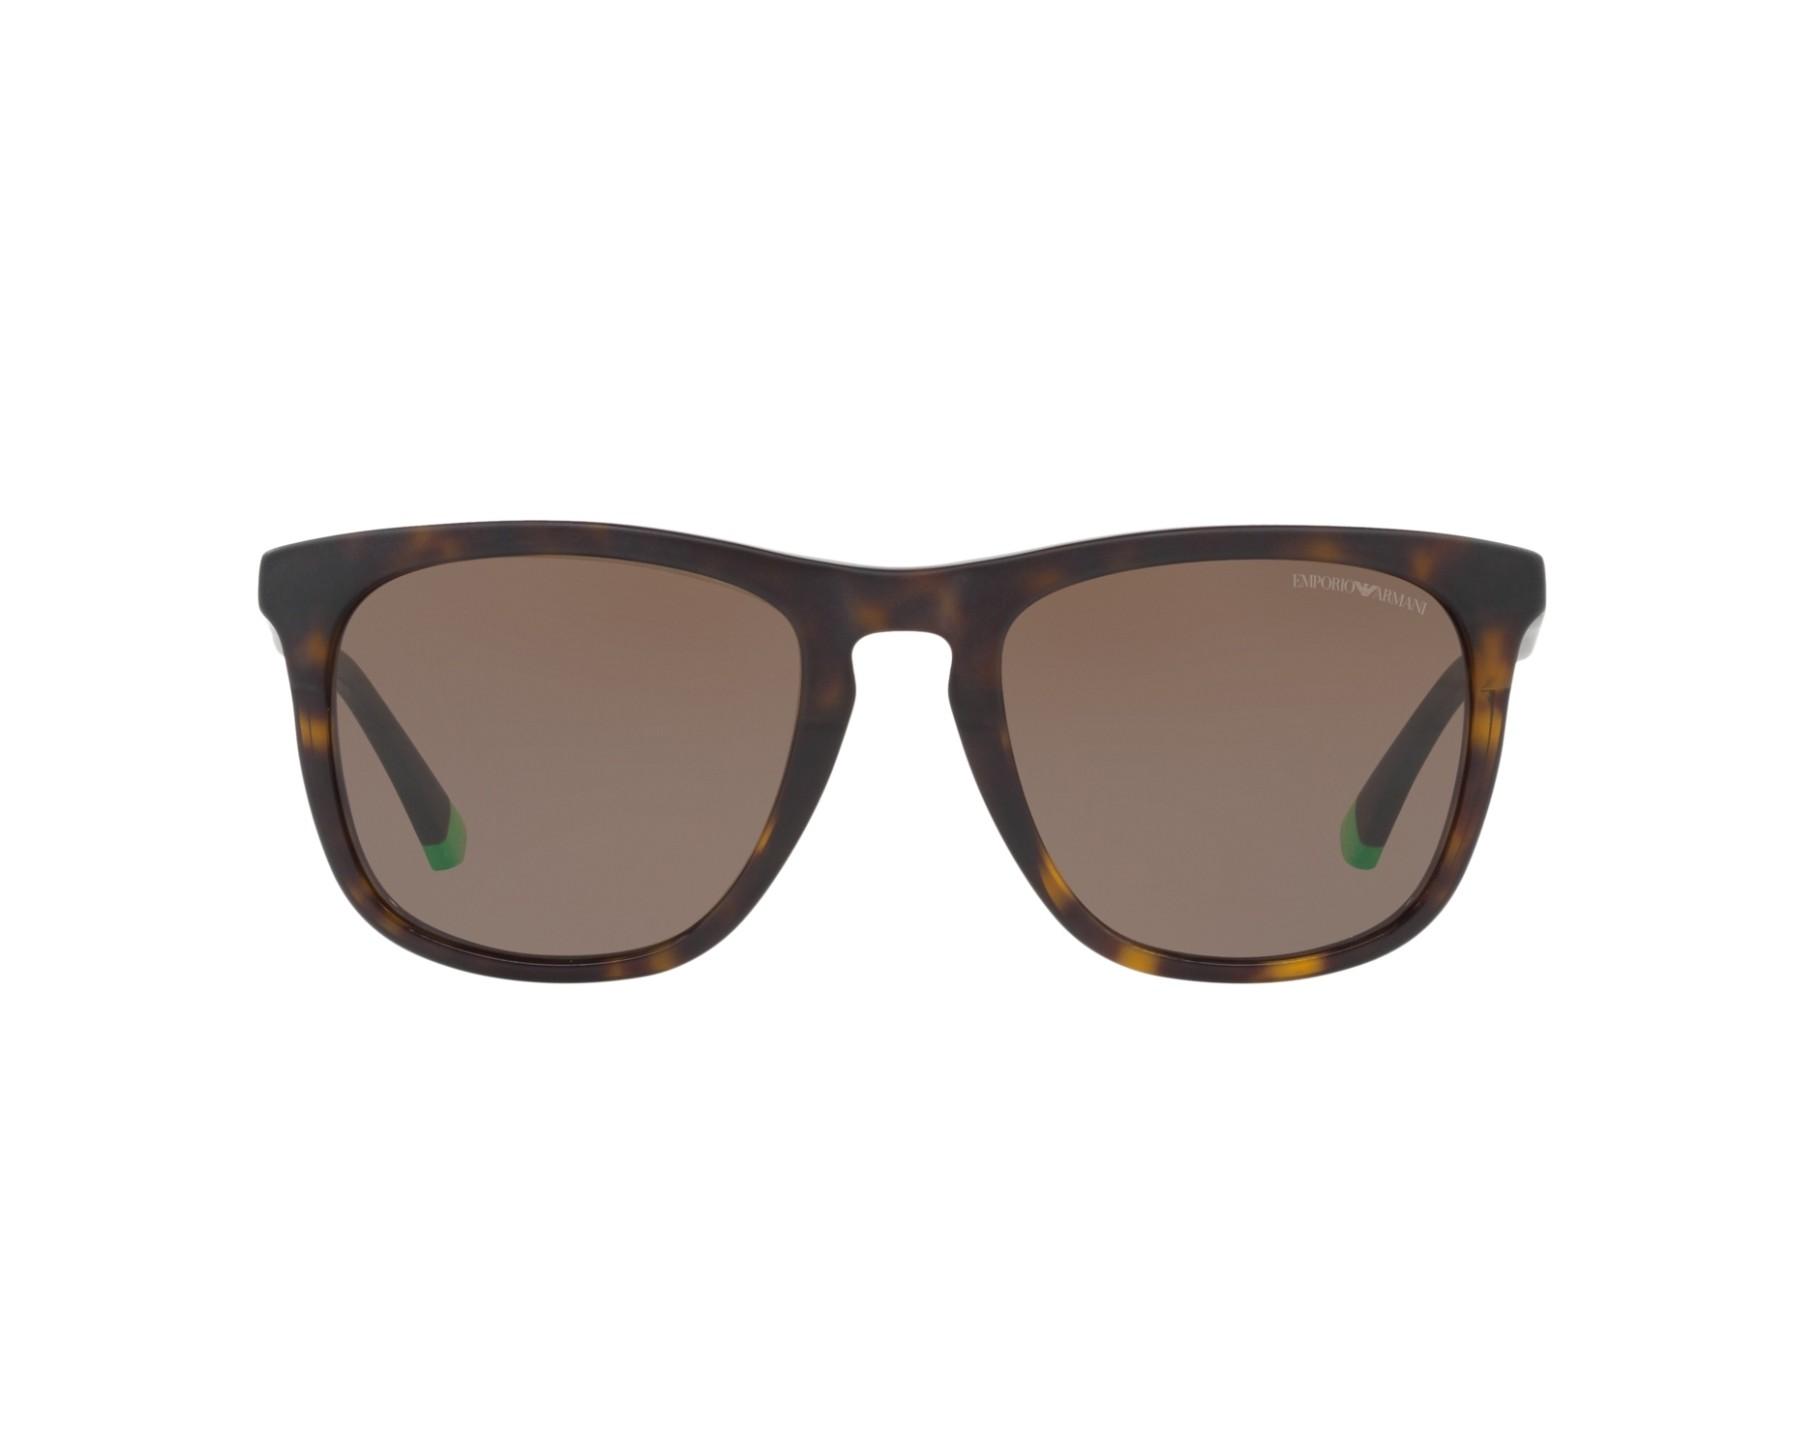 Emporio Armani EA4105 Sonnenbrille Mattgrün 55976R 53mm itgPsw